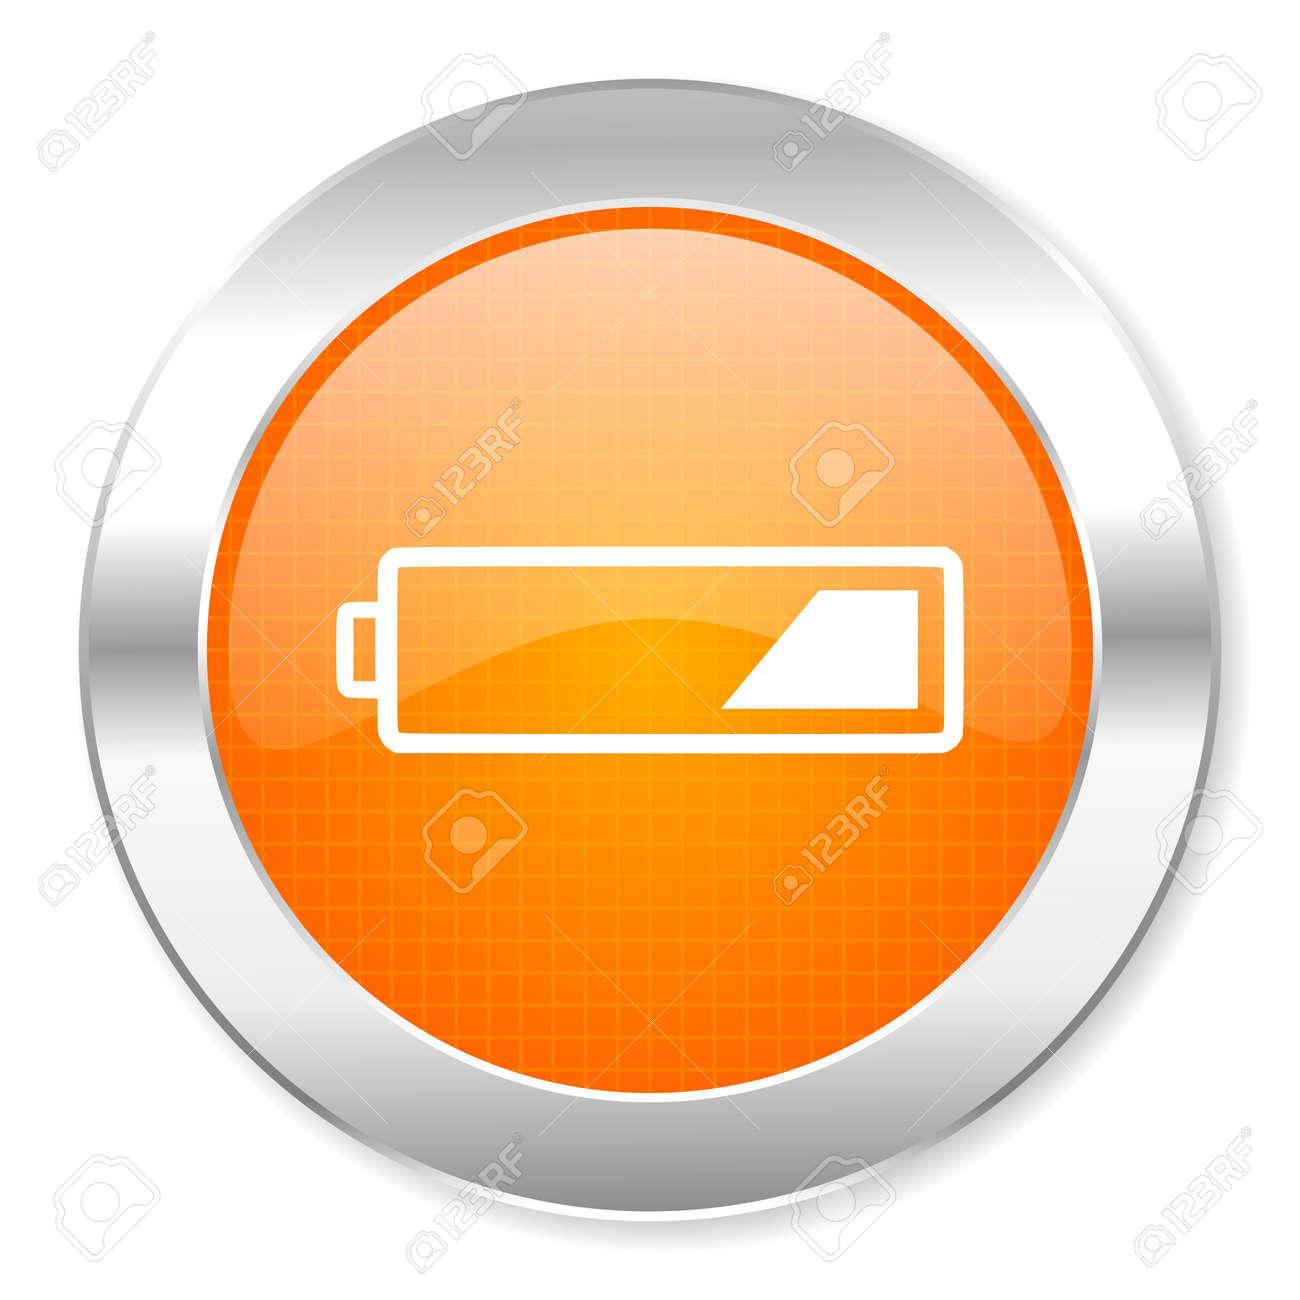 battery icon Stock Photo - 21443175